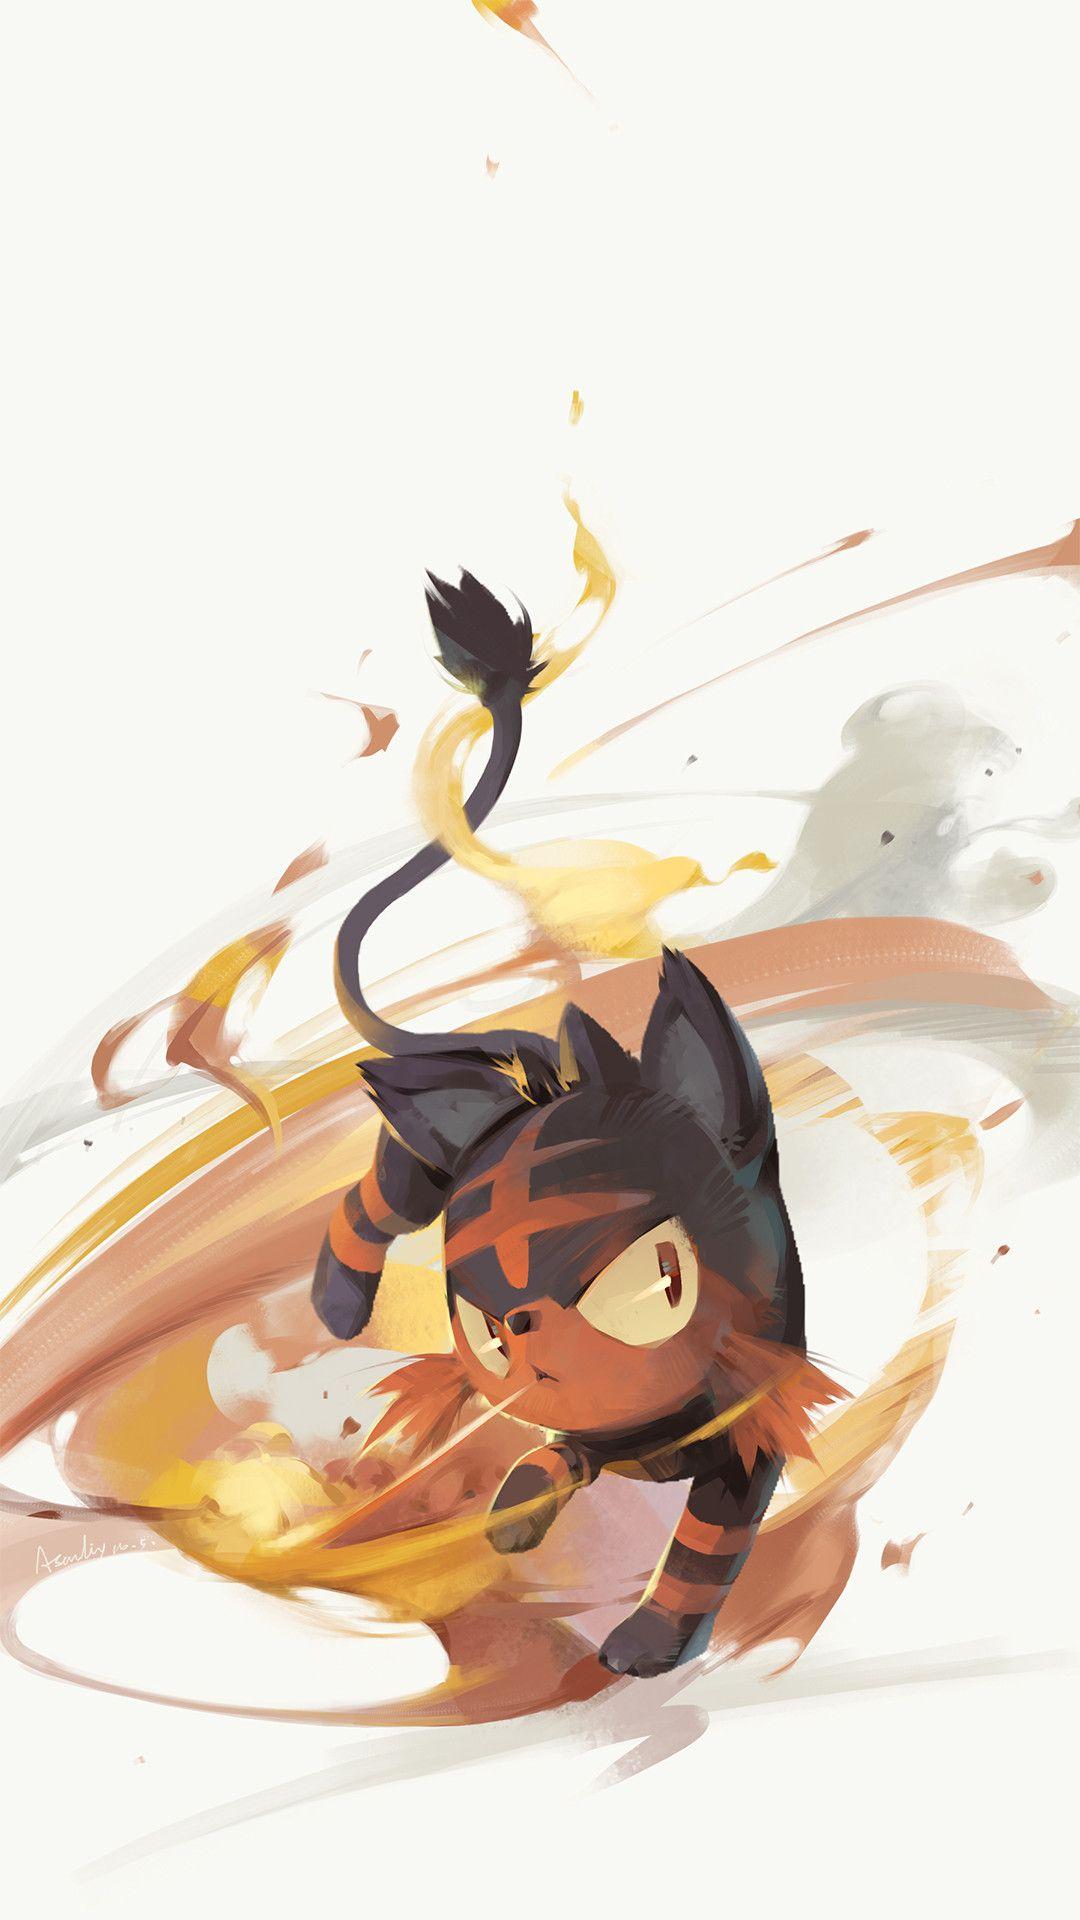 artstation - pokemon fanarts, asen liy | pokemon | pinterest